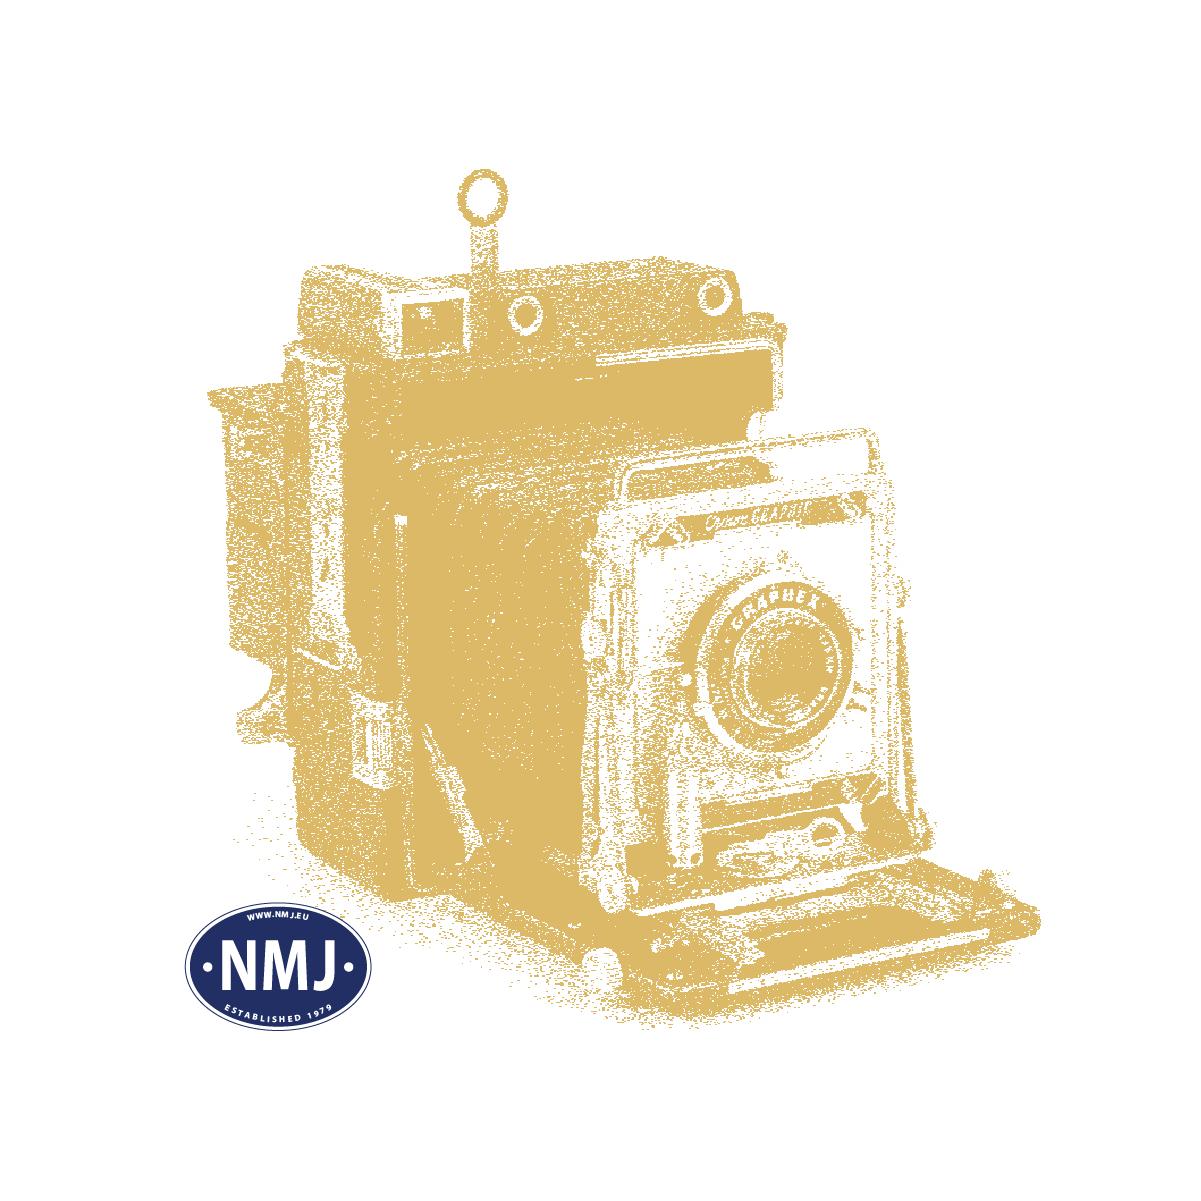 NMJ Topline MAV M61.020, AC Digital